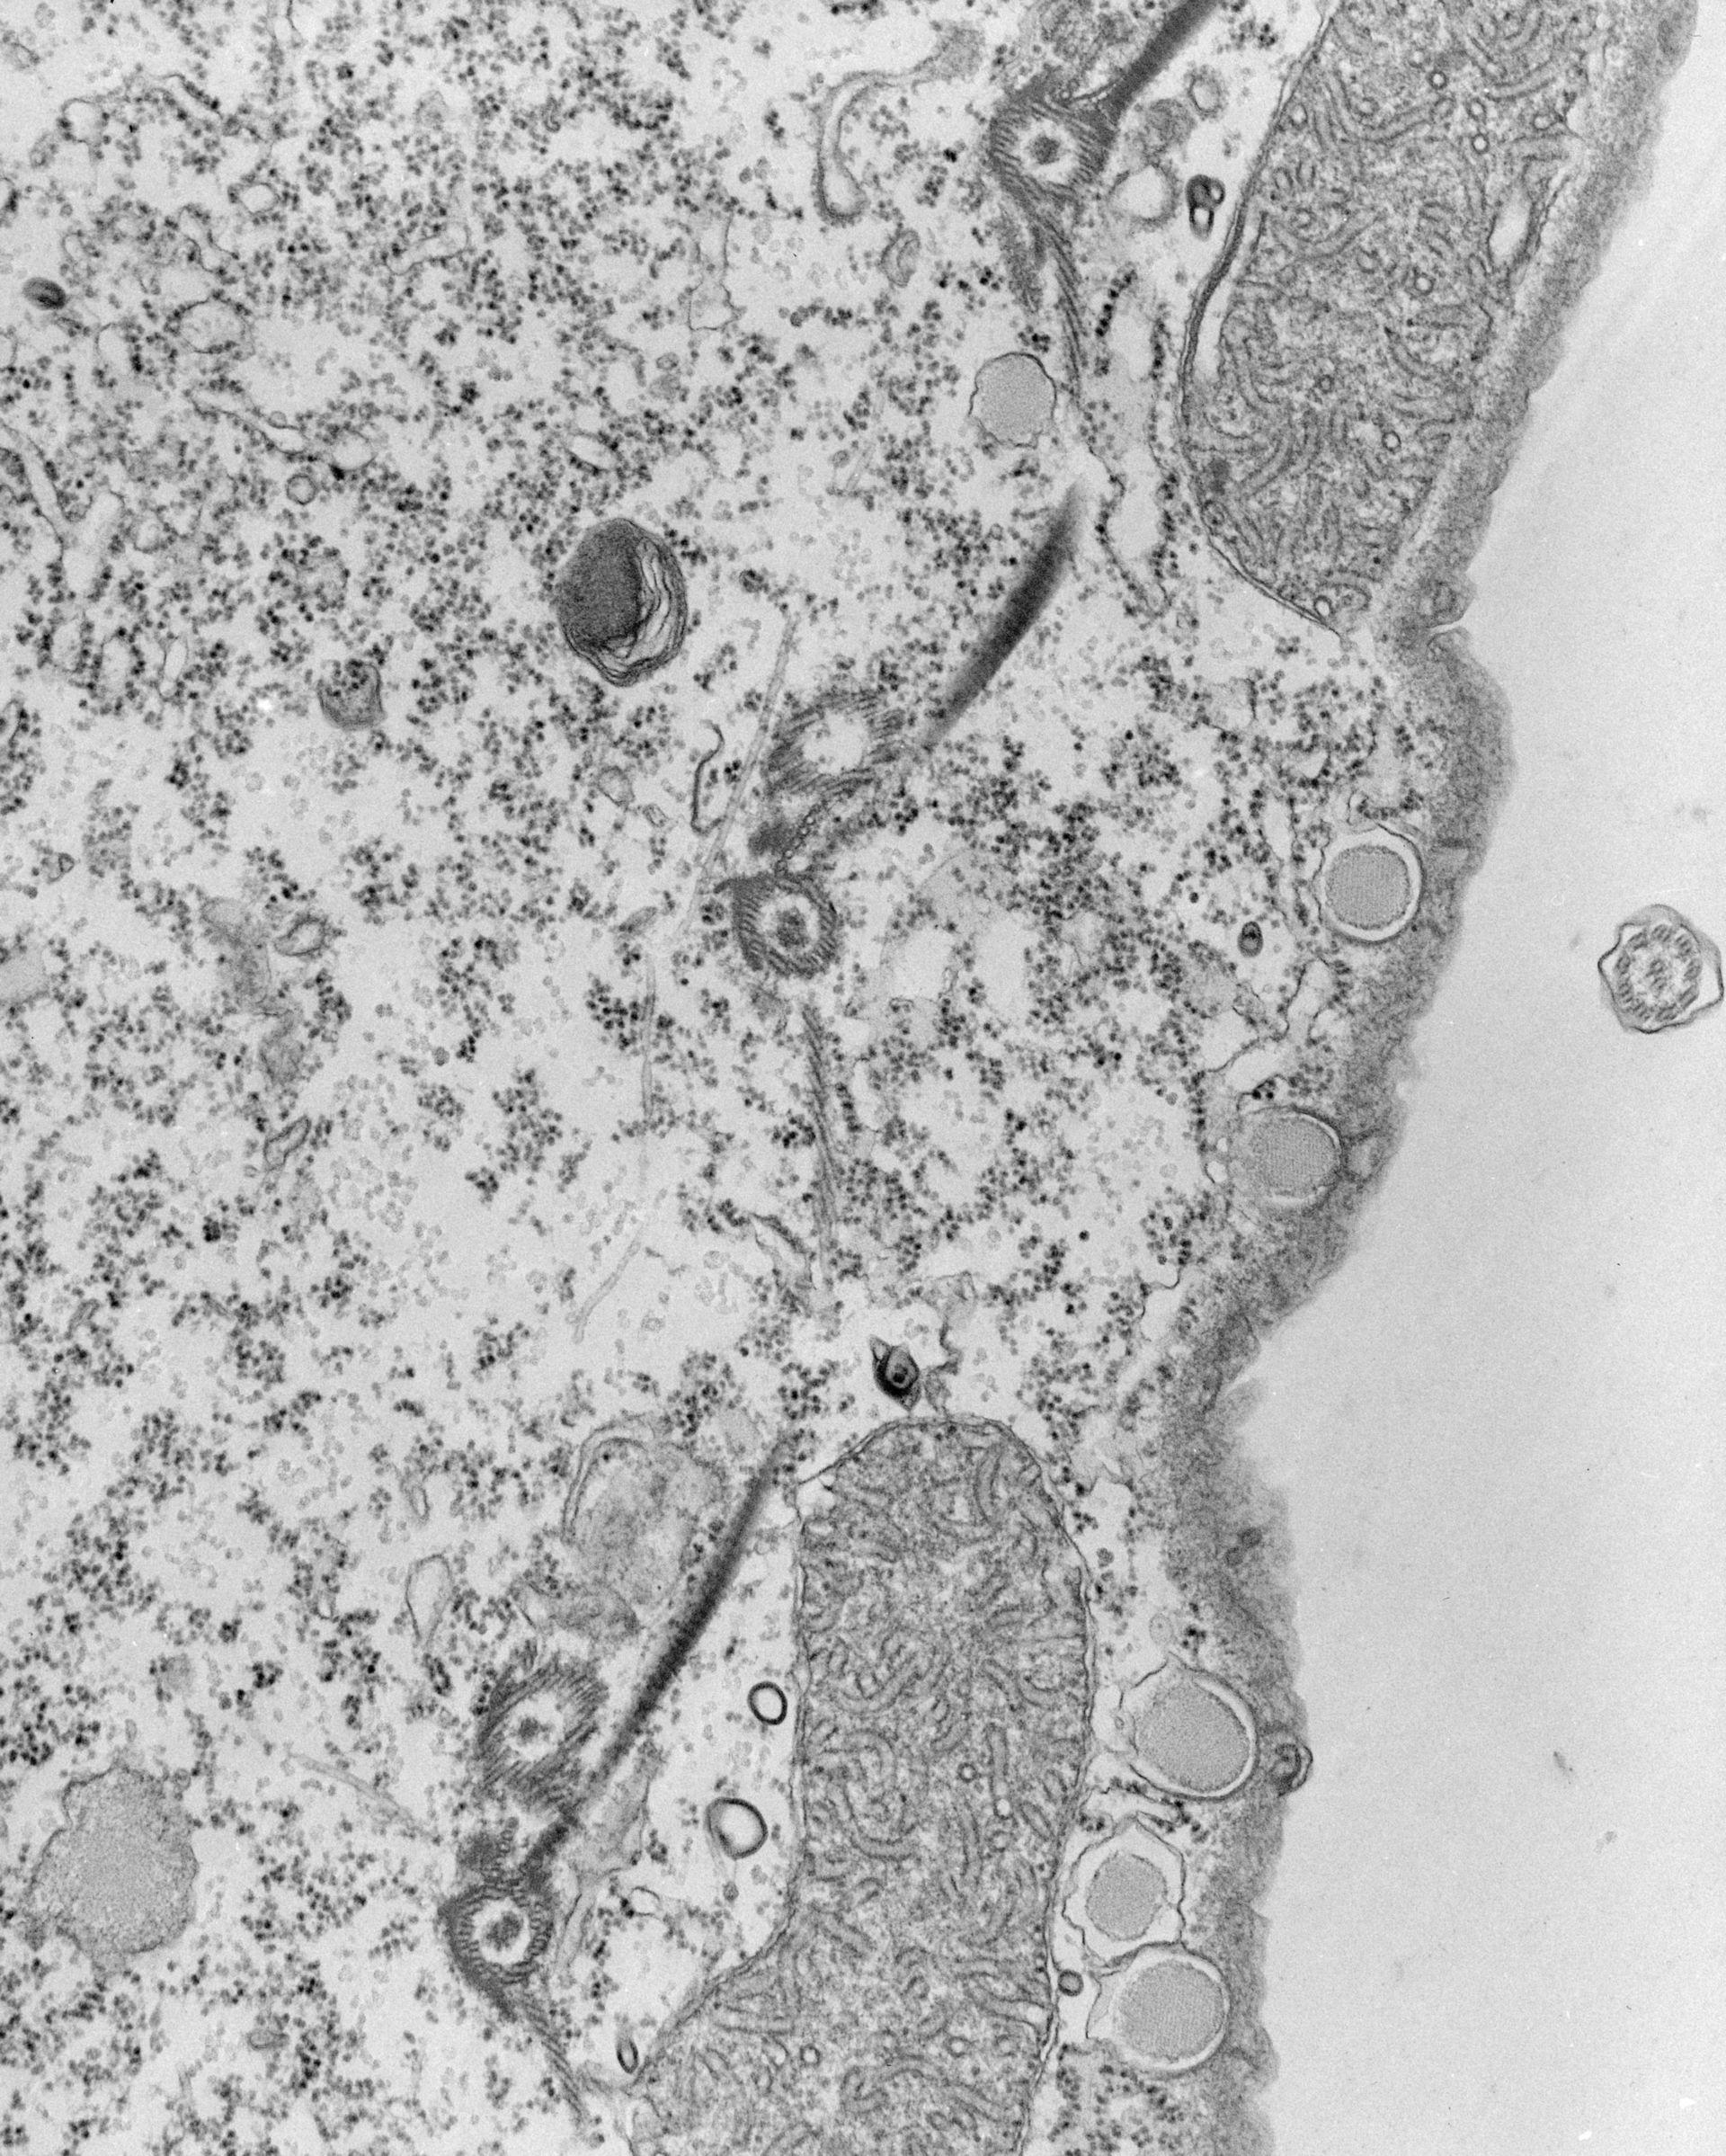 Tetrahymena pyriformis (Fibrille) - CIL:39796